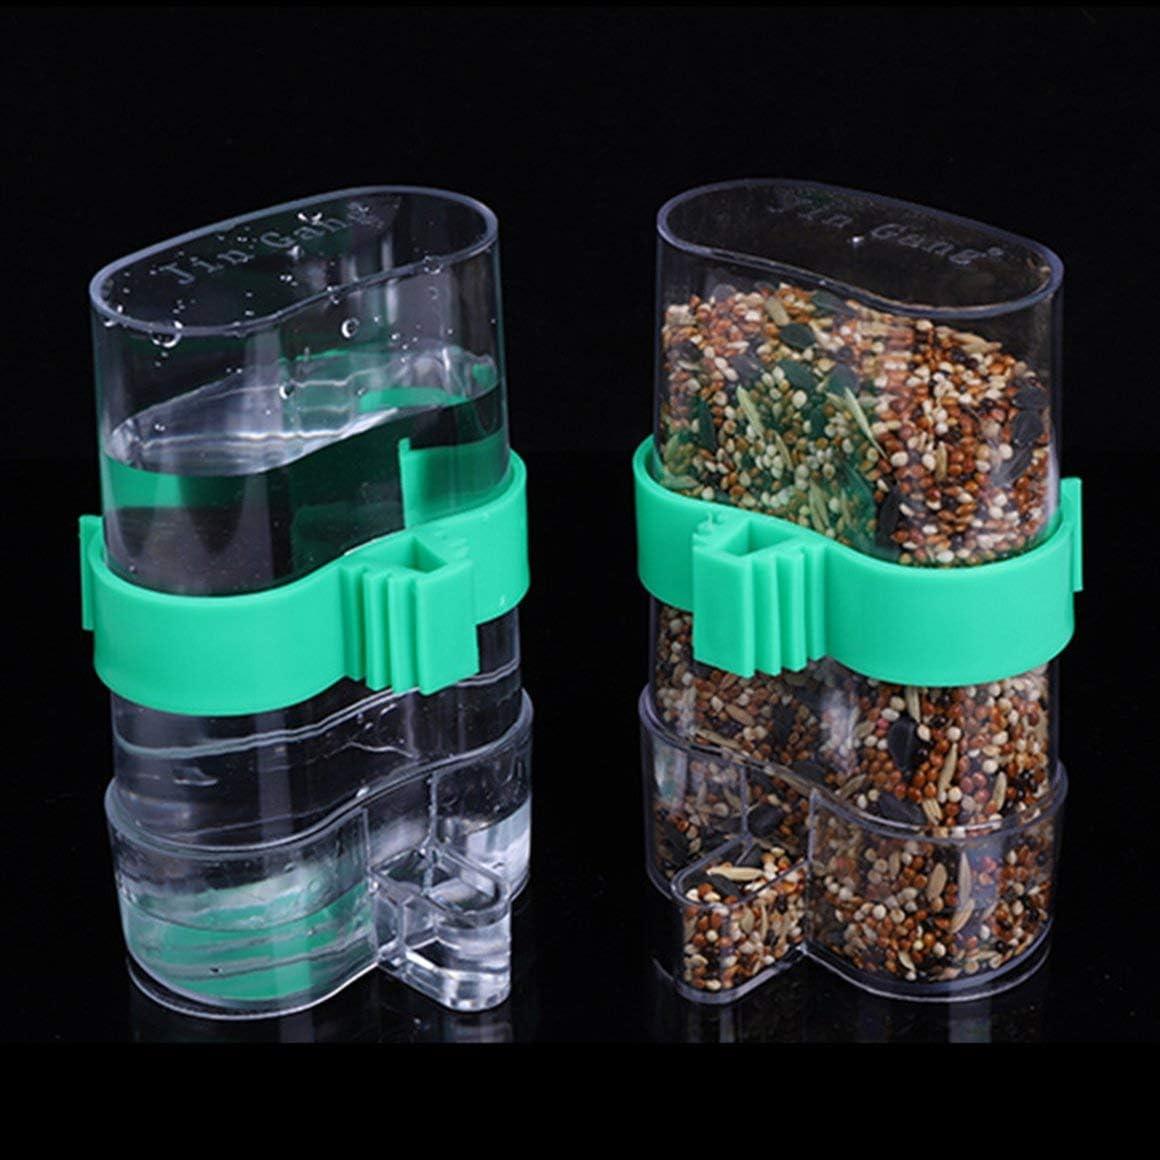 Trampa de agua automática para pájaros Suministros para jaulas de pájaros Accesorios para jaulas de pájaros Fuente para beber Utensilios para loros Paperllong®